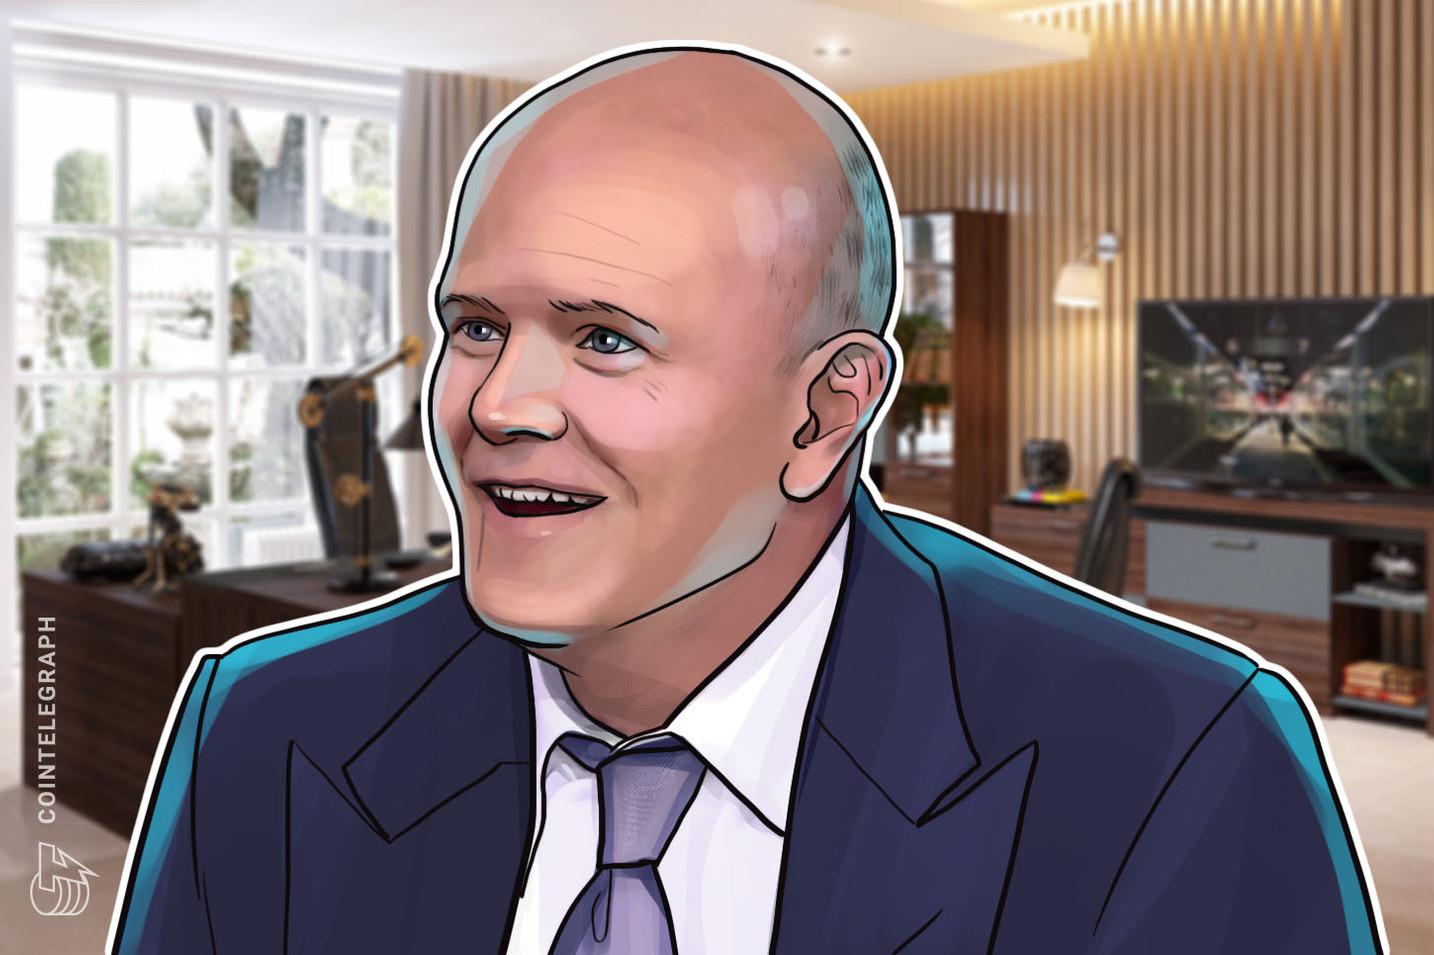 Mike Novogratz: Bitcoin-Kurs steigt auf 65.000 US-Dollar